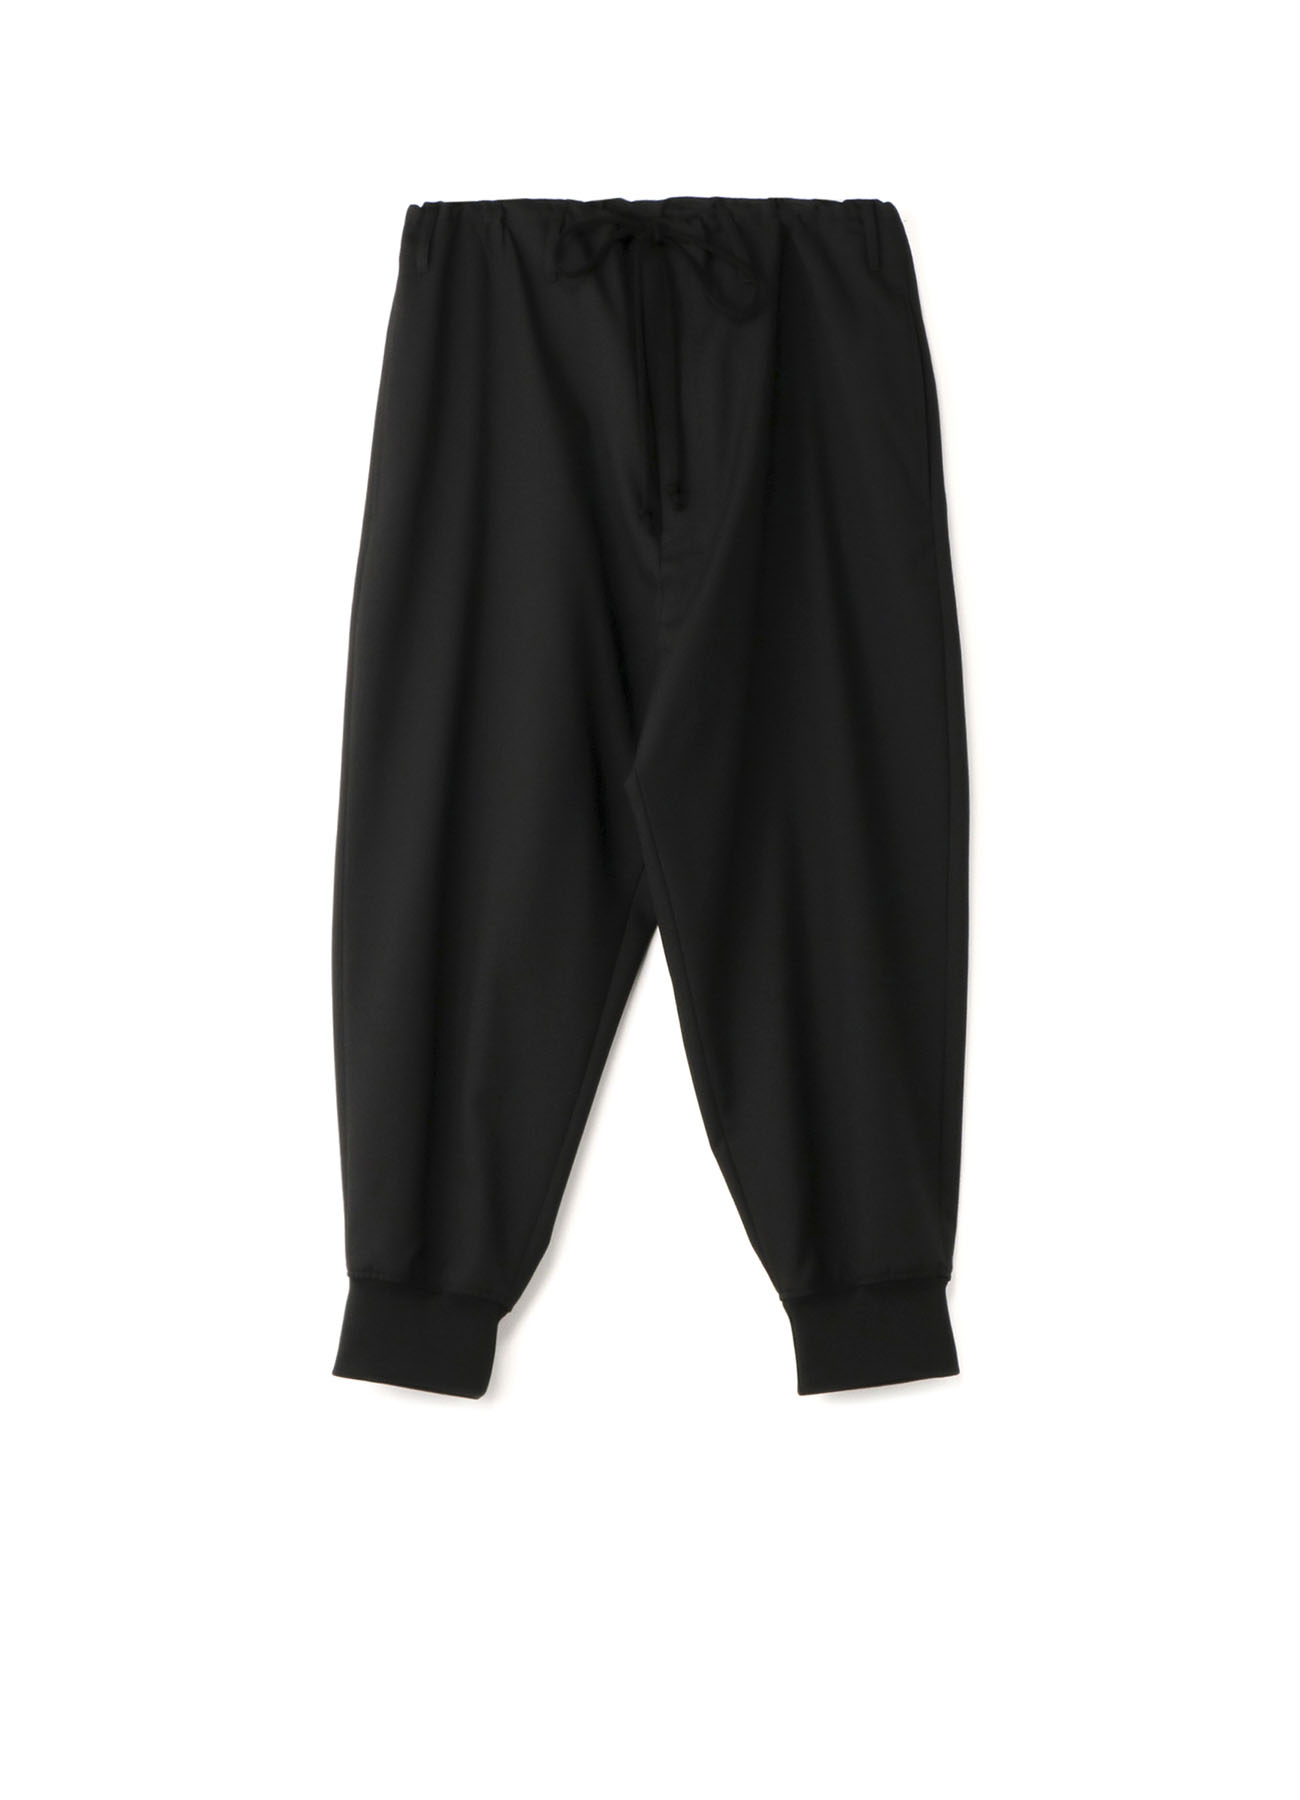 T/W Gabardine Waist String Rib Pants